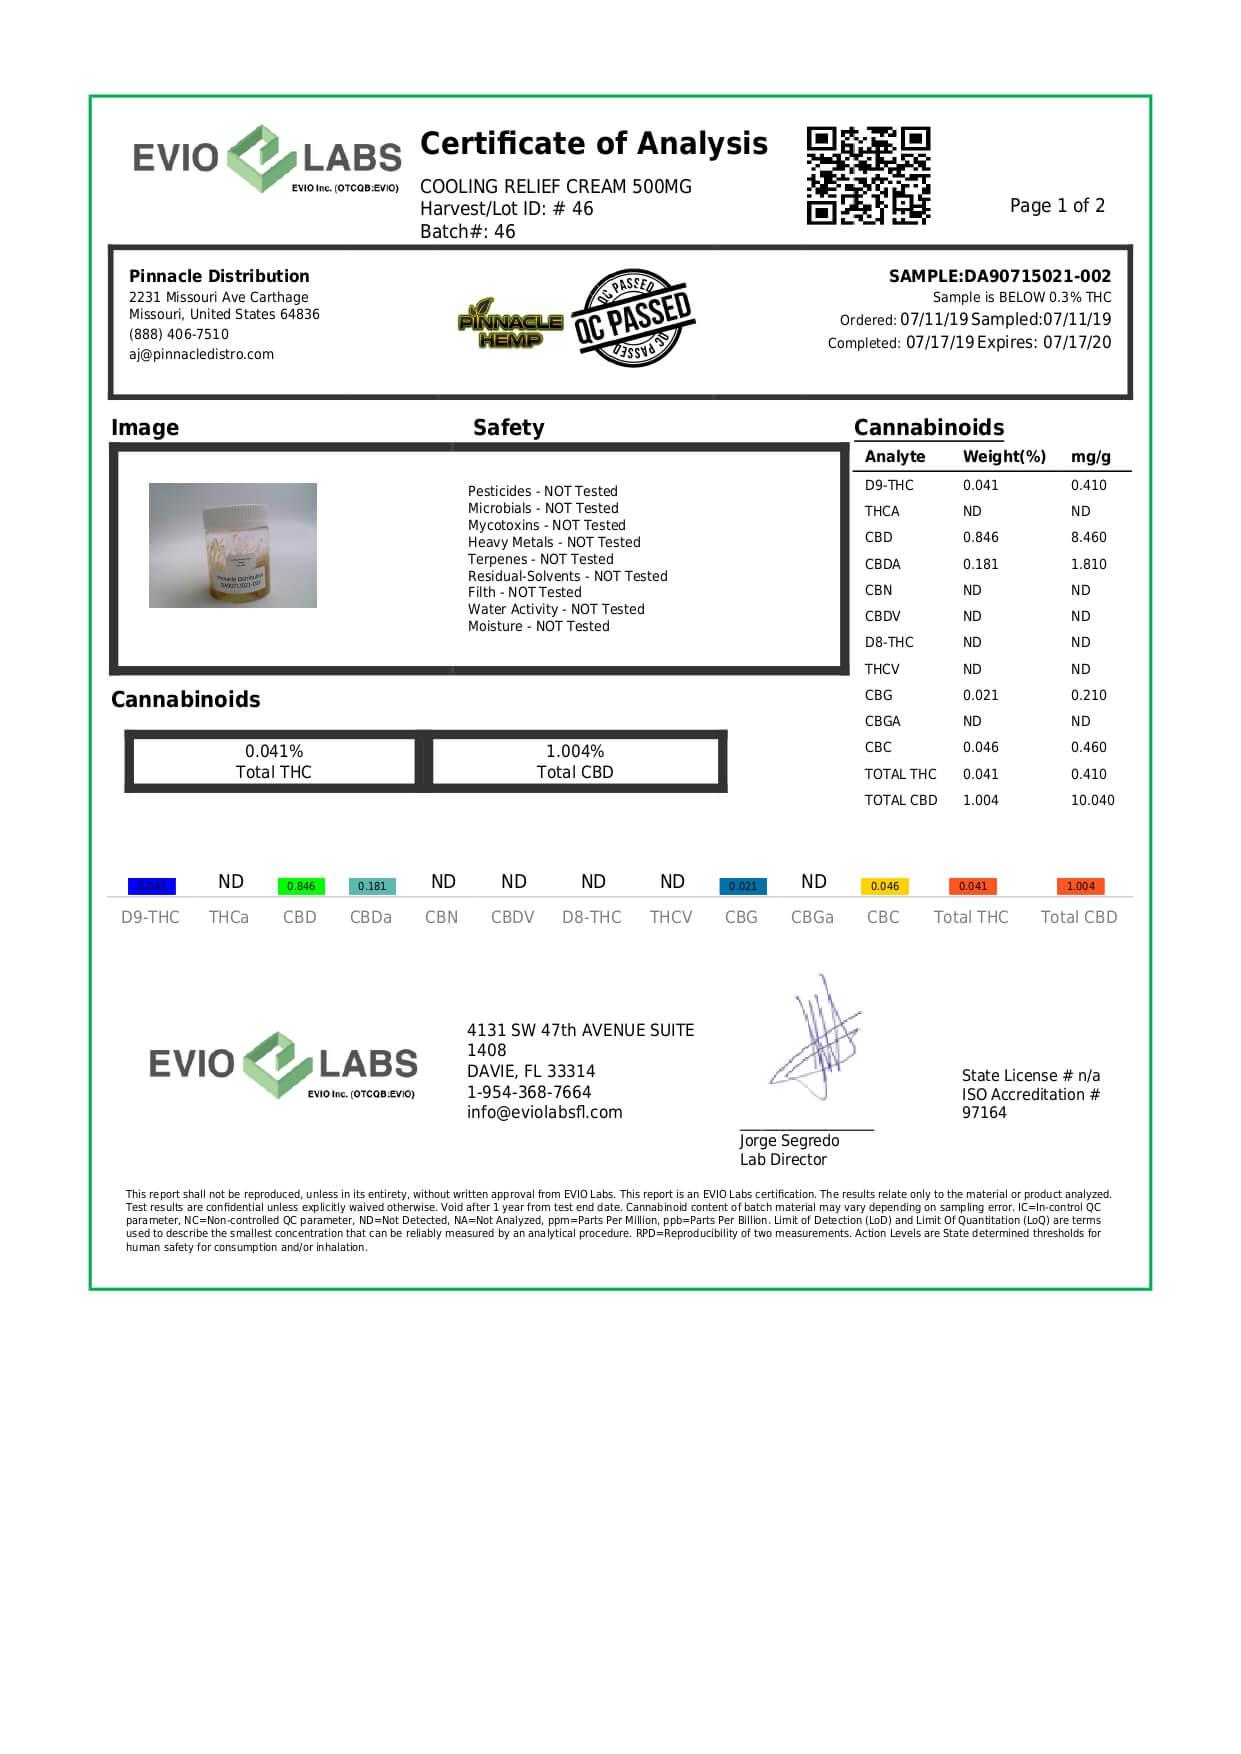 Pinnacle Hemp CBD Topical Relief Cream Cooling 500mg Lab Report